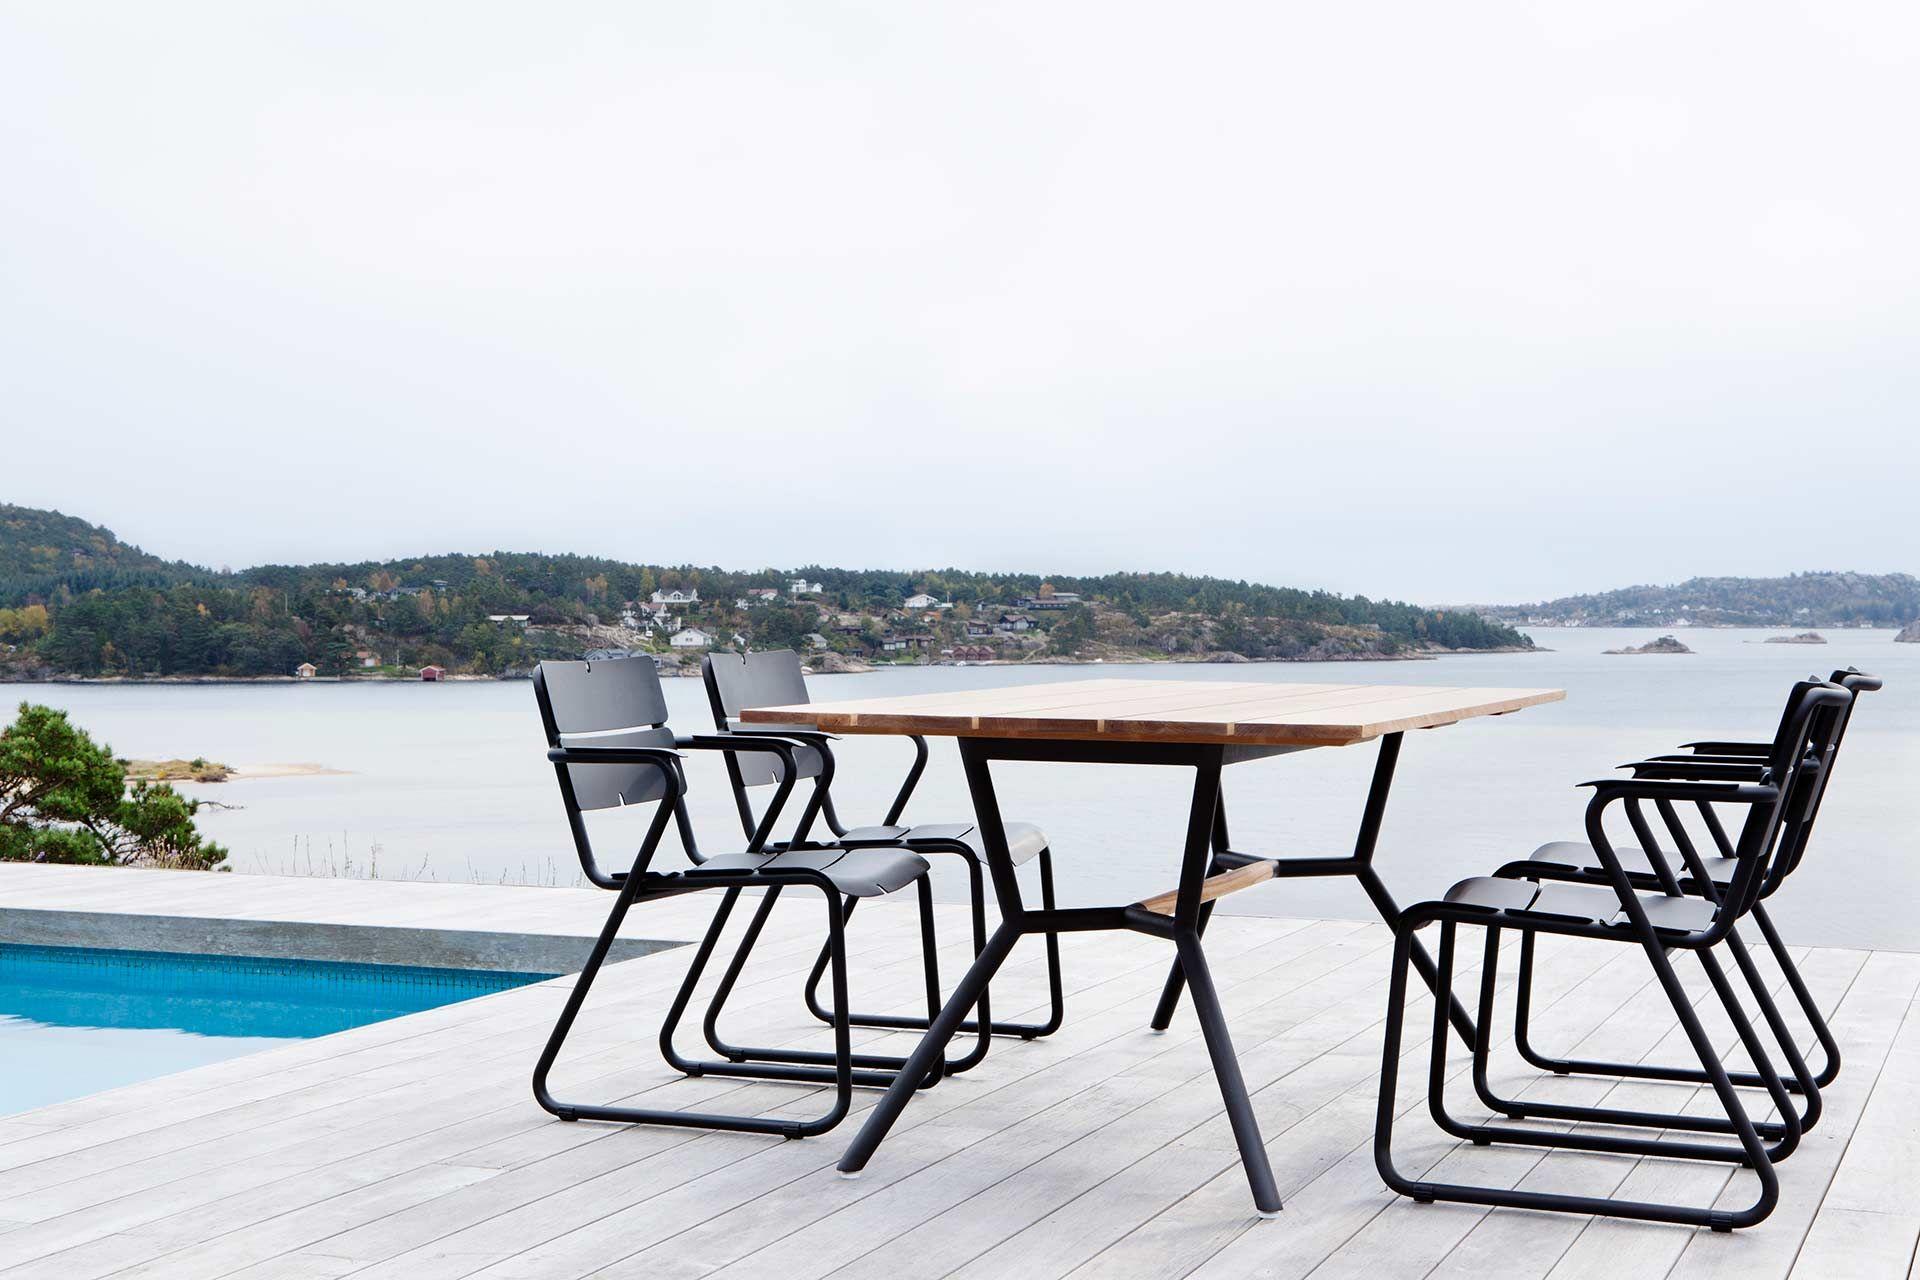 Hochwertige Aluminium Stuhle Aus Der Oasiq Corail Serie Besonders